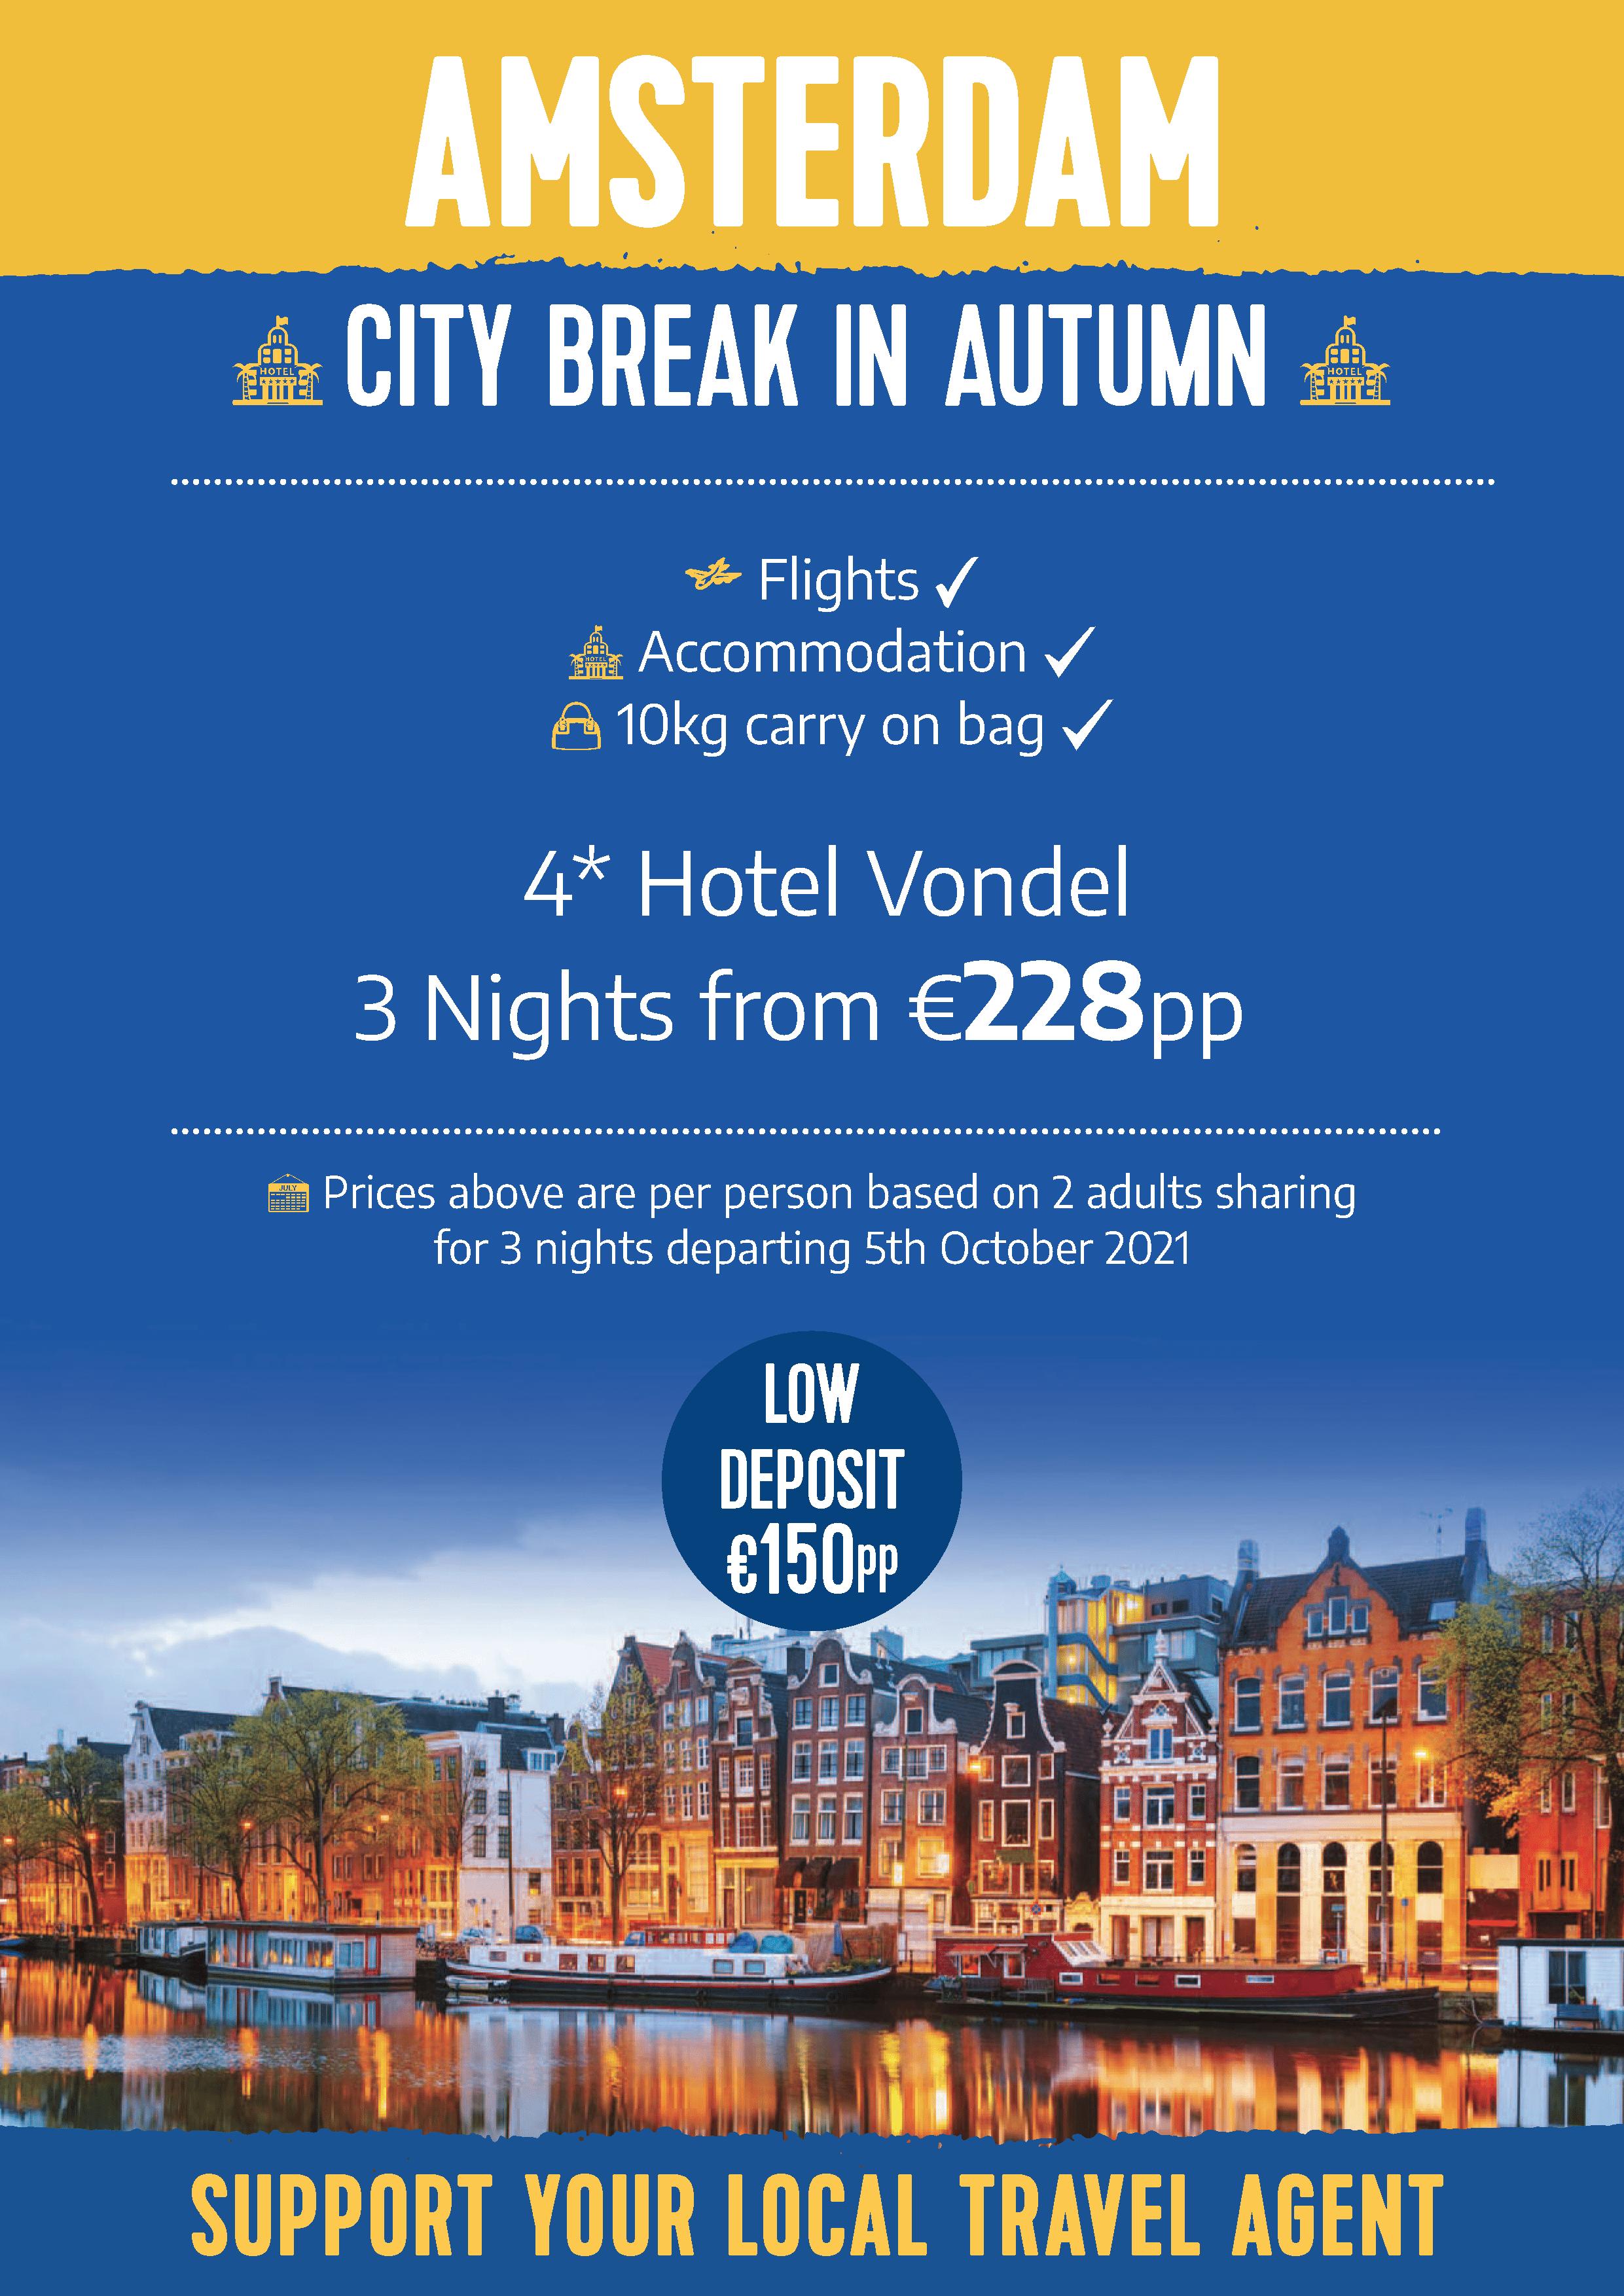 Amsterdam Autumn City Break